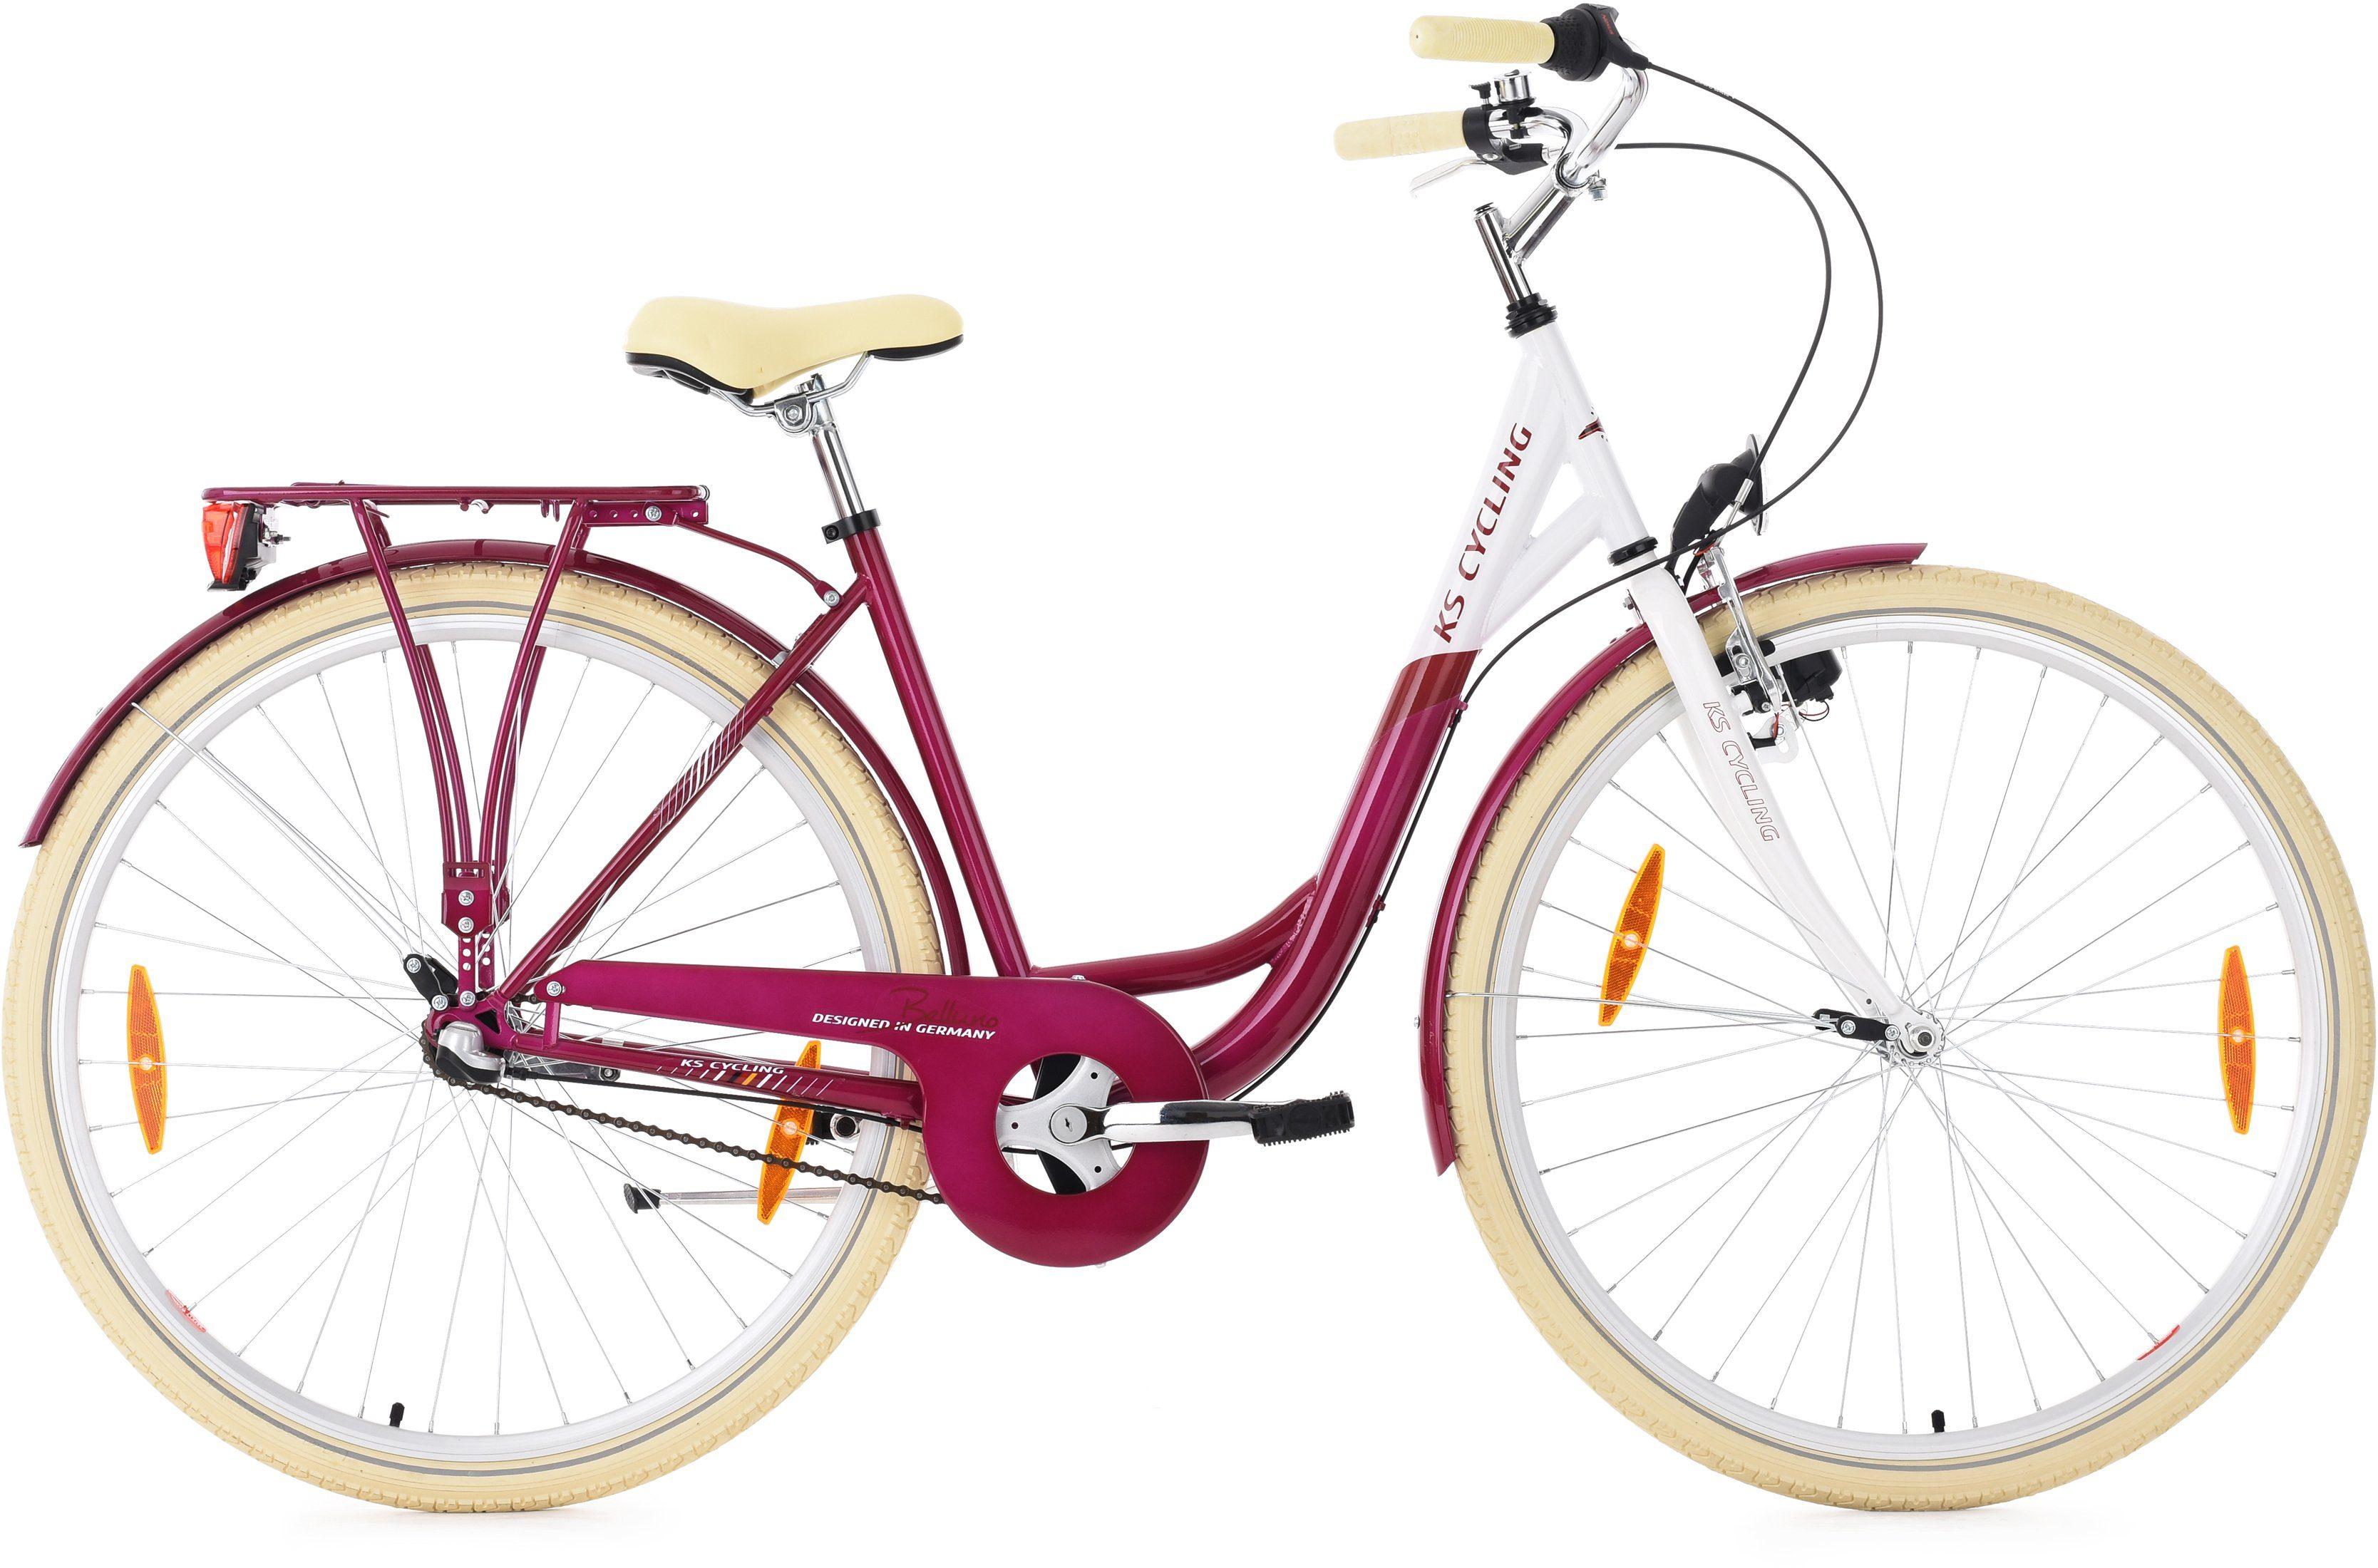 KS Cycling Damen-Cityrad, 28 Zoll, Shimano 3 Gang Shimano Nexus Nabenschaltung, »Belluno«